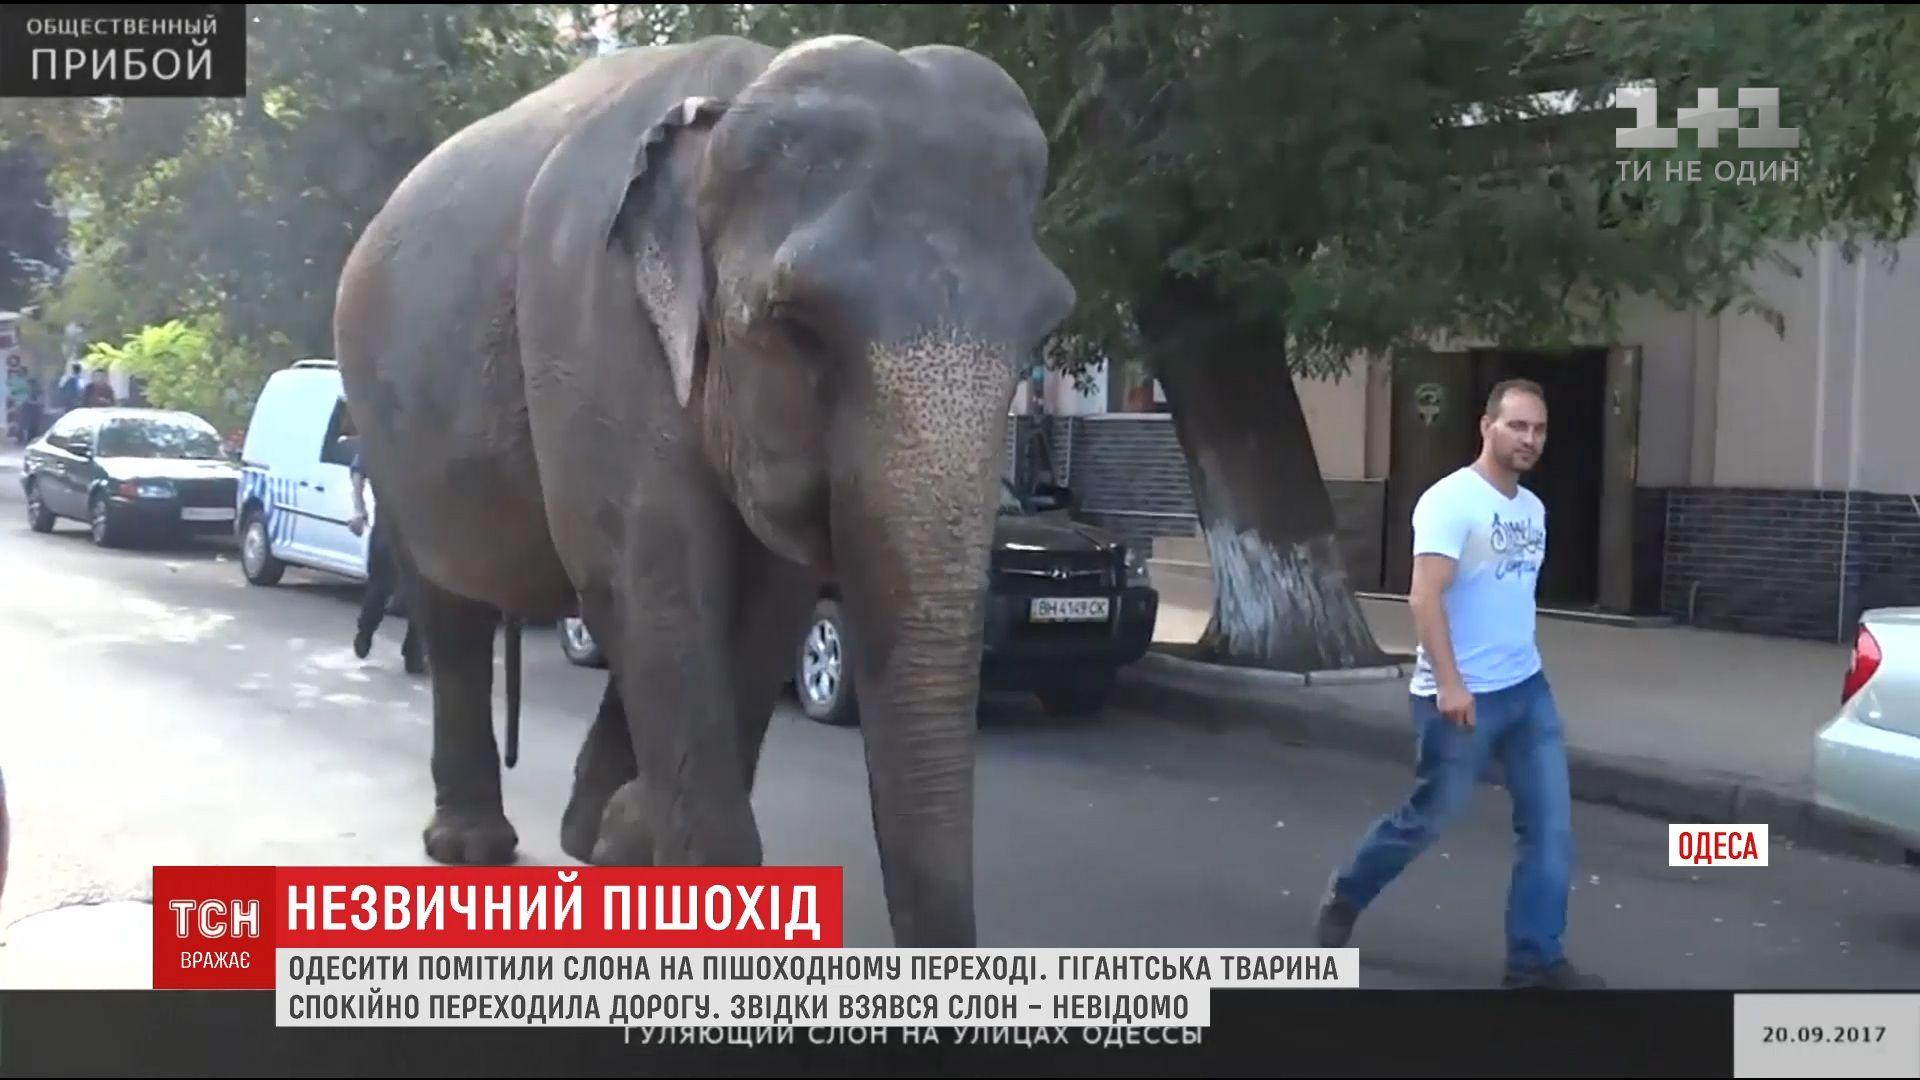 Величезний слон влаштував прогулянку вулицями Одеси /